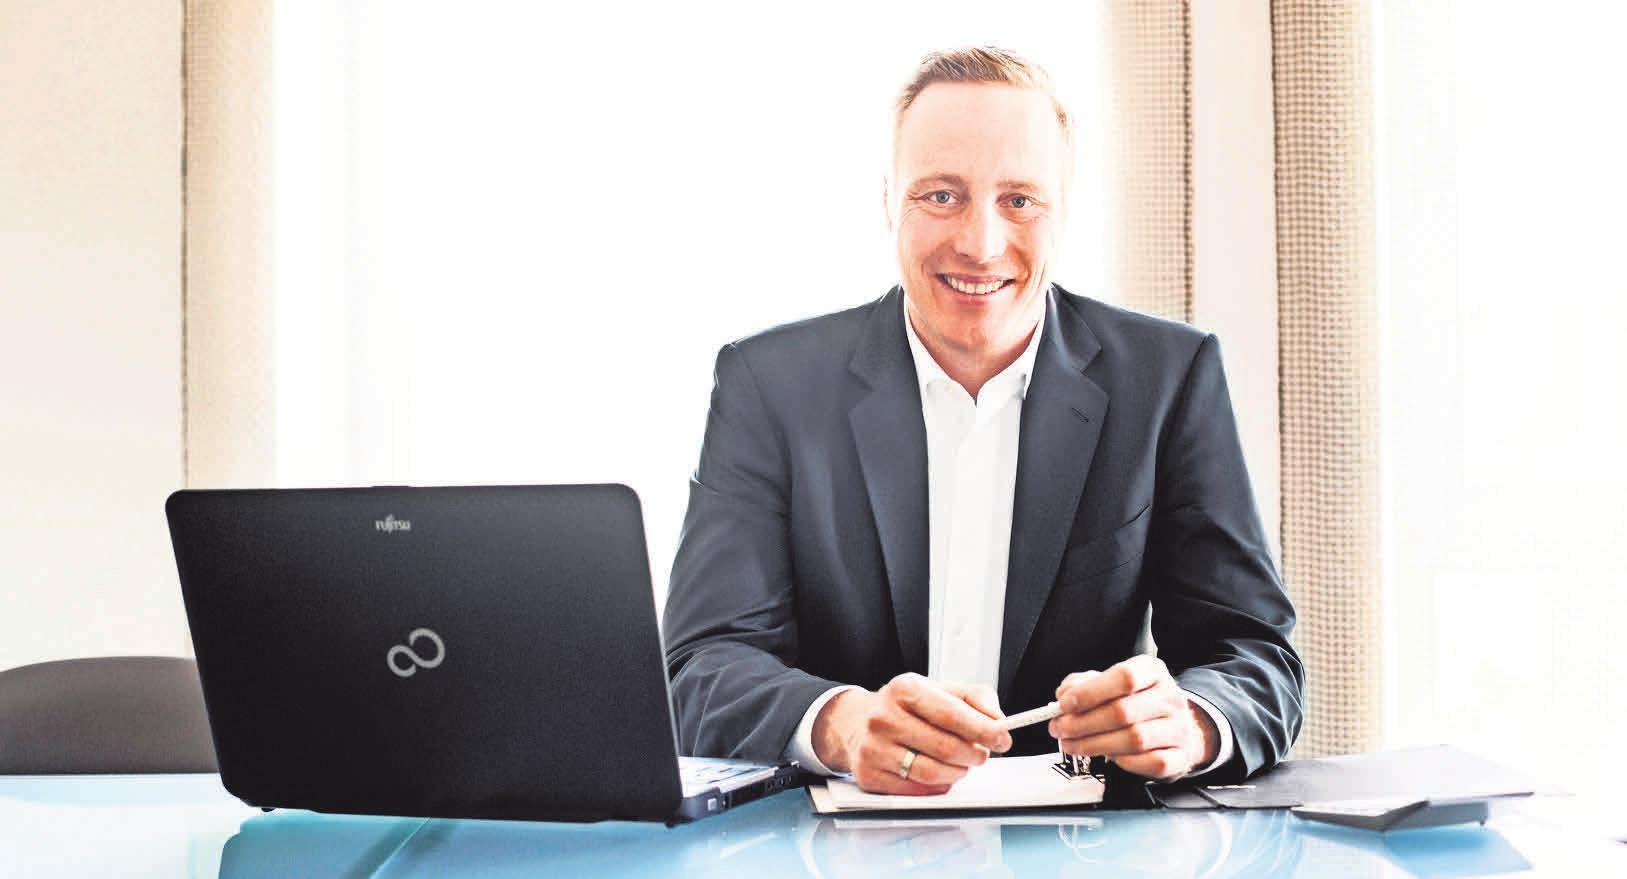 Dipl.-Kfm. (FH) Christian Katz, Steuerberater